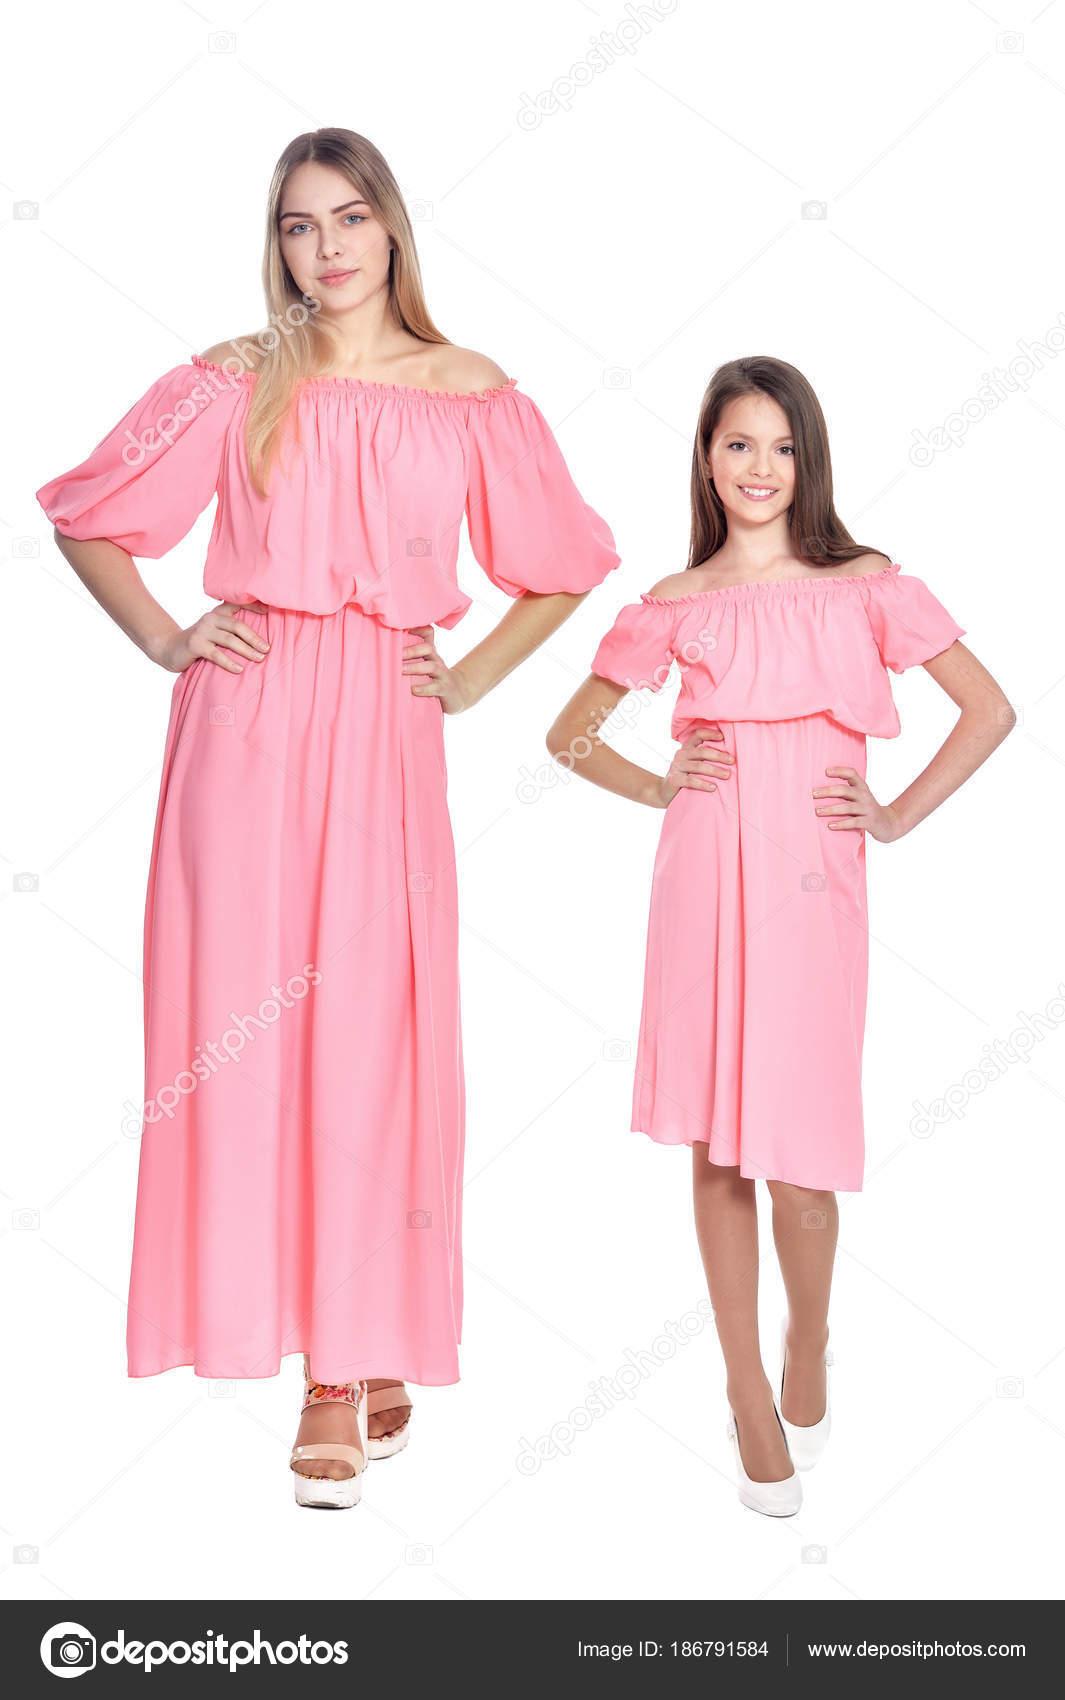 Retrato Hermosa Mujer Hija Rosa Vestidos Posando Aislado Blanco ...